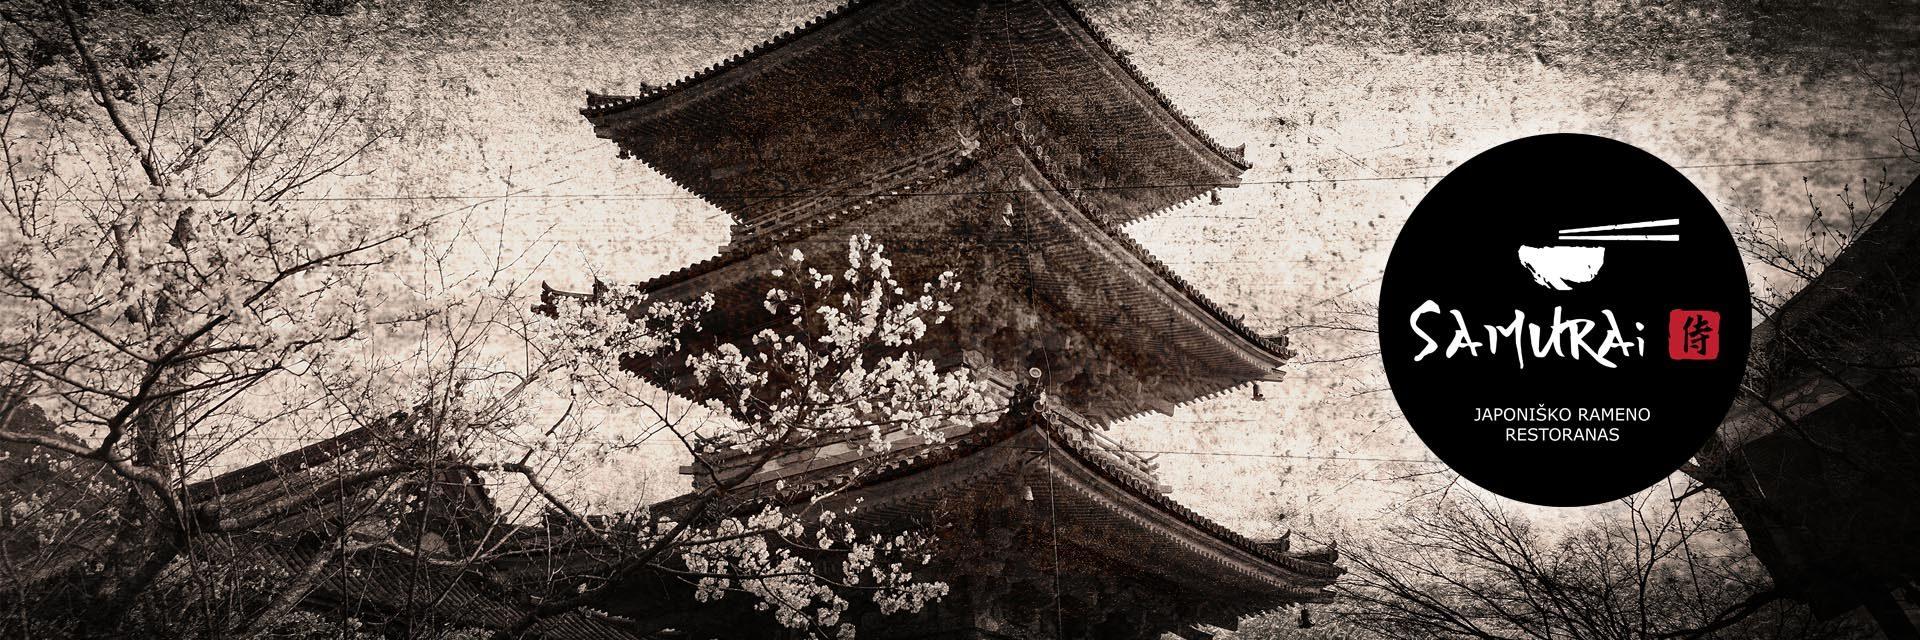 Japoniško rameno restoranas Samurai